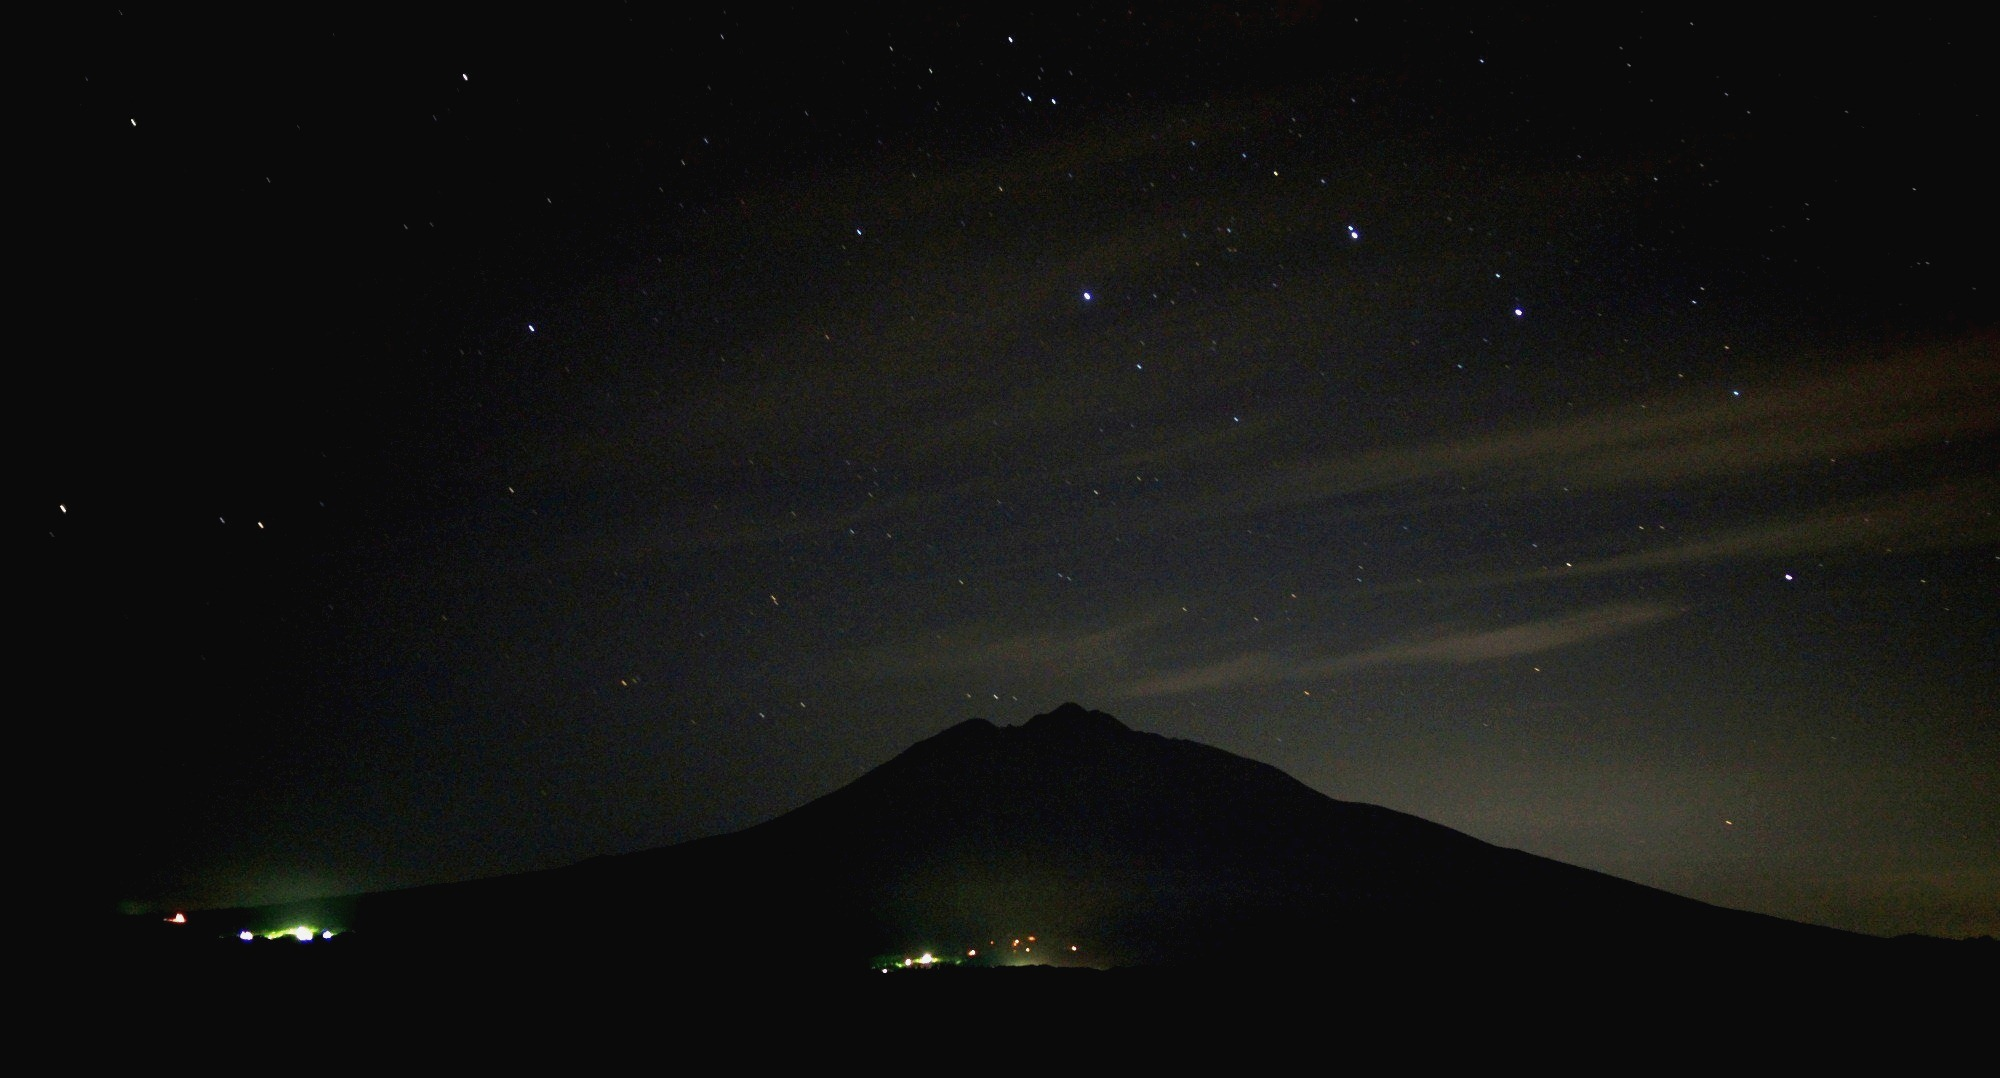 青森 風景 夏 津軽 弘前市 天体観測 高台 ロマントピア 光 星夜 岩木山